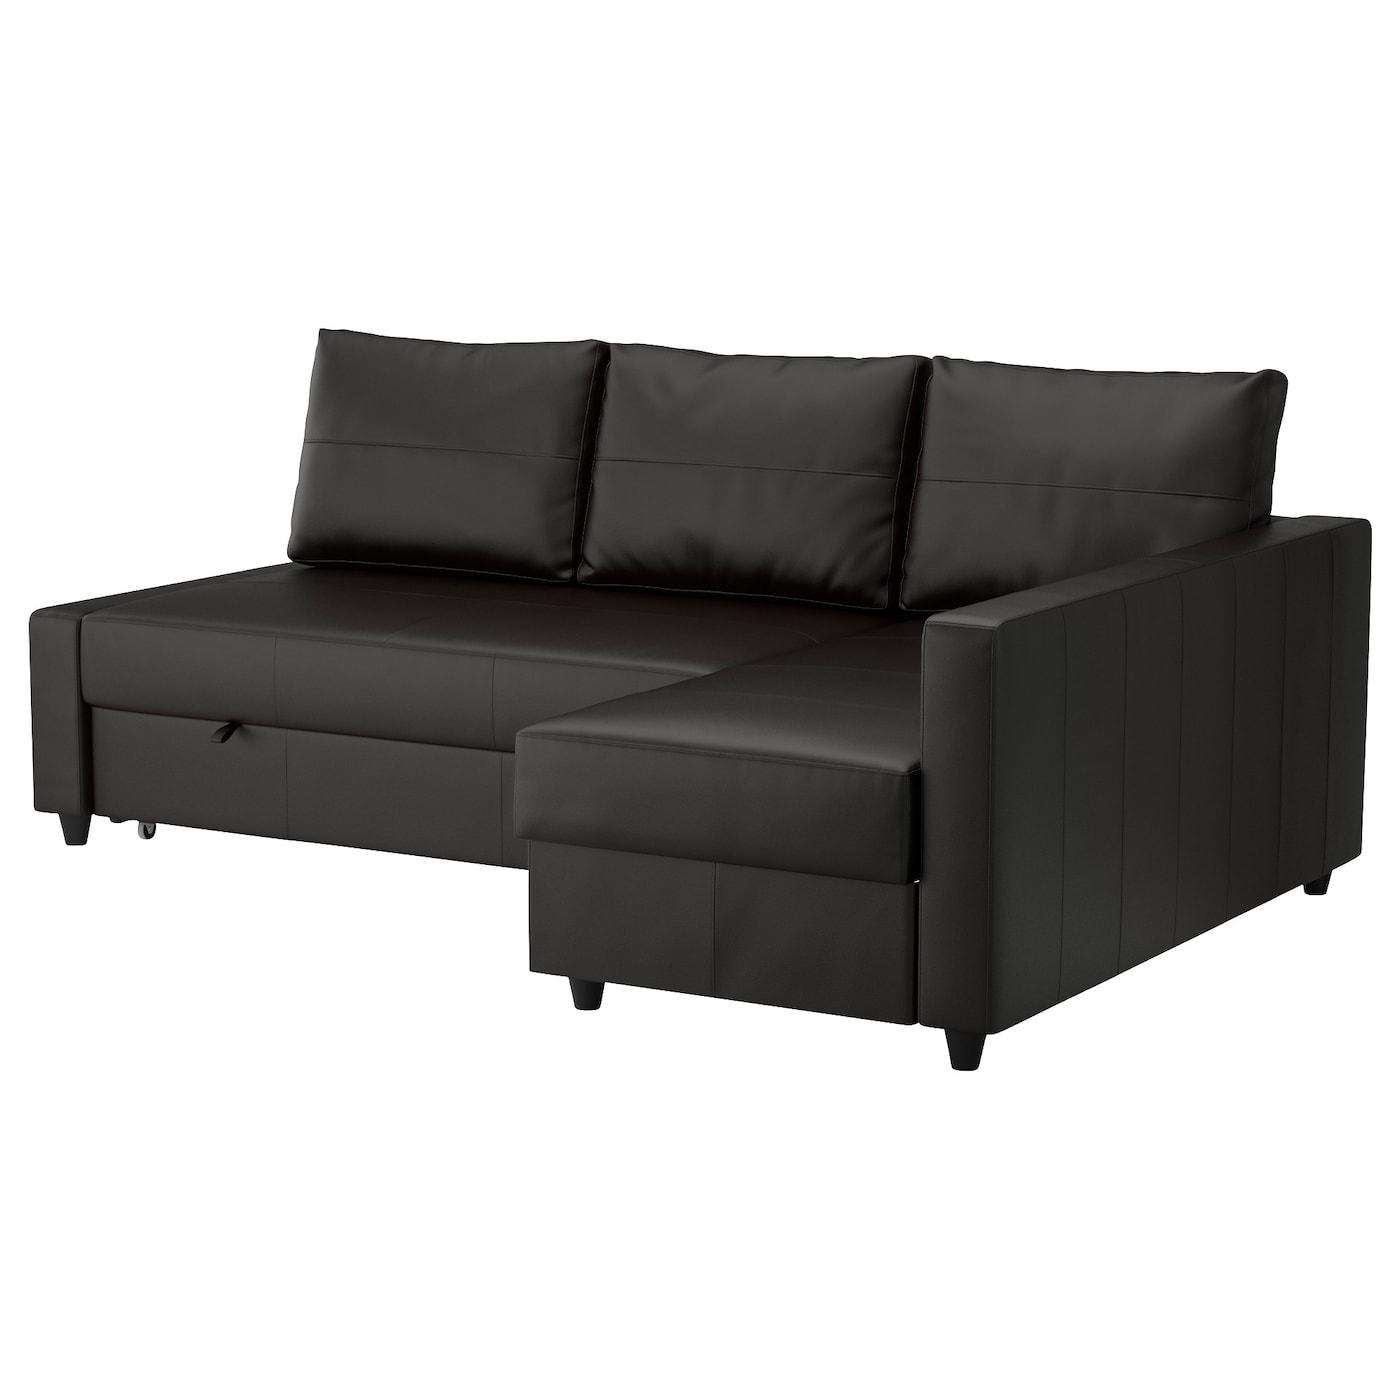 - FRIHETEN Sleeper Sectional,3 Seat W/storage, Bomstad Black - IKEA